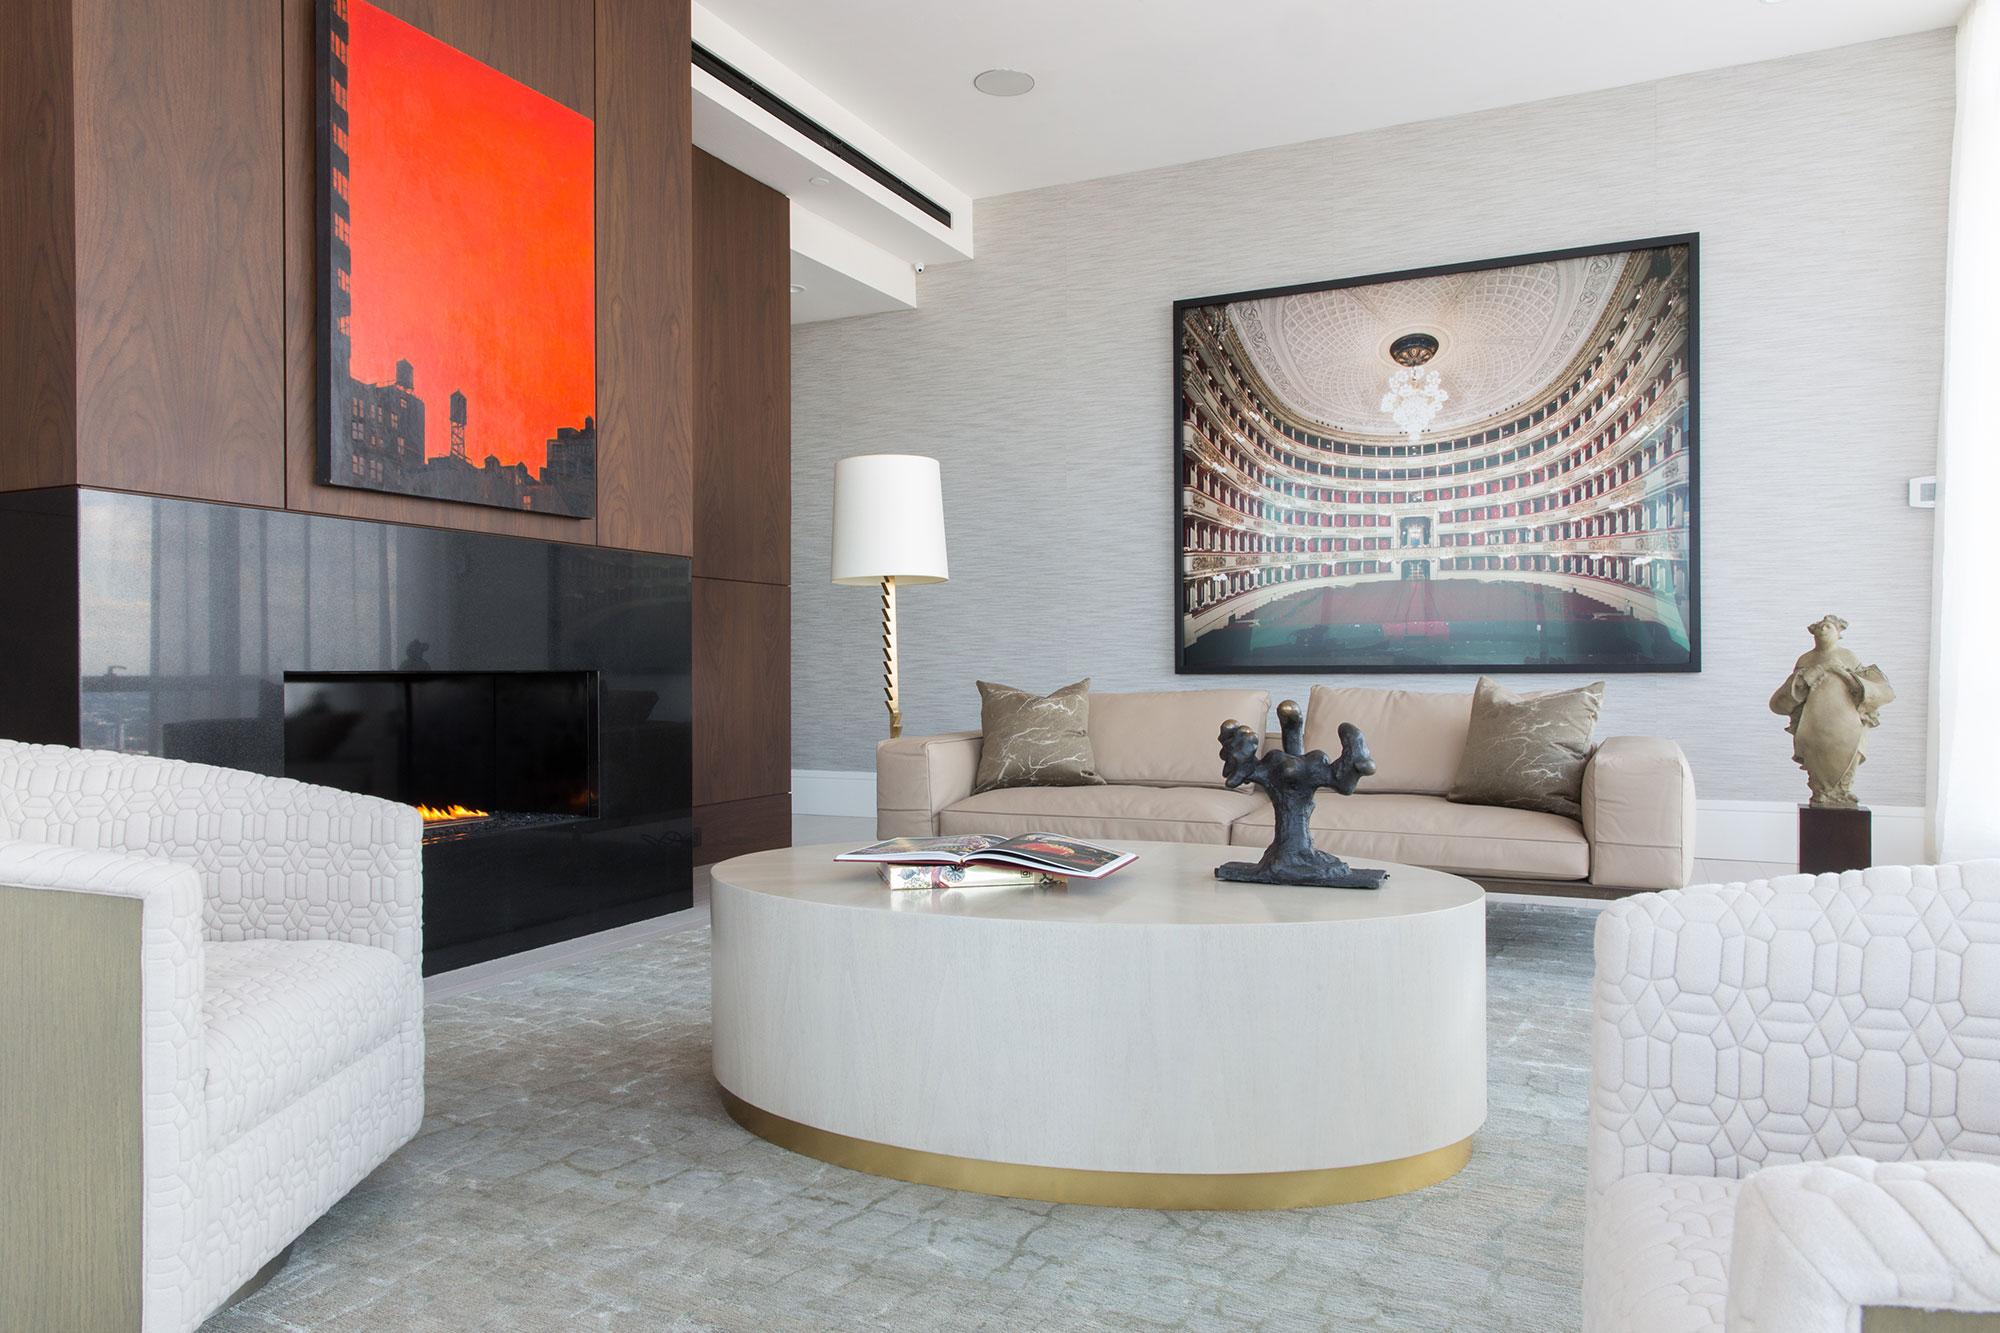 apartments luxury lofts interior watermark seaport boston pin design